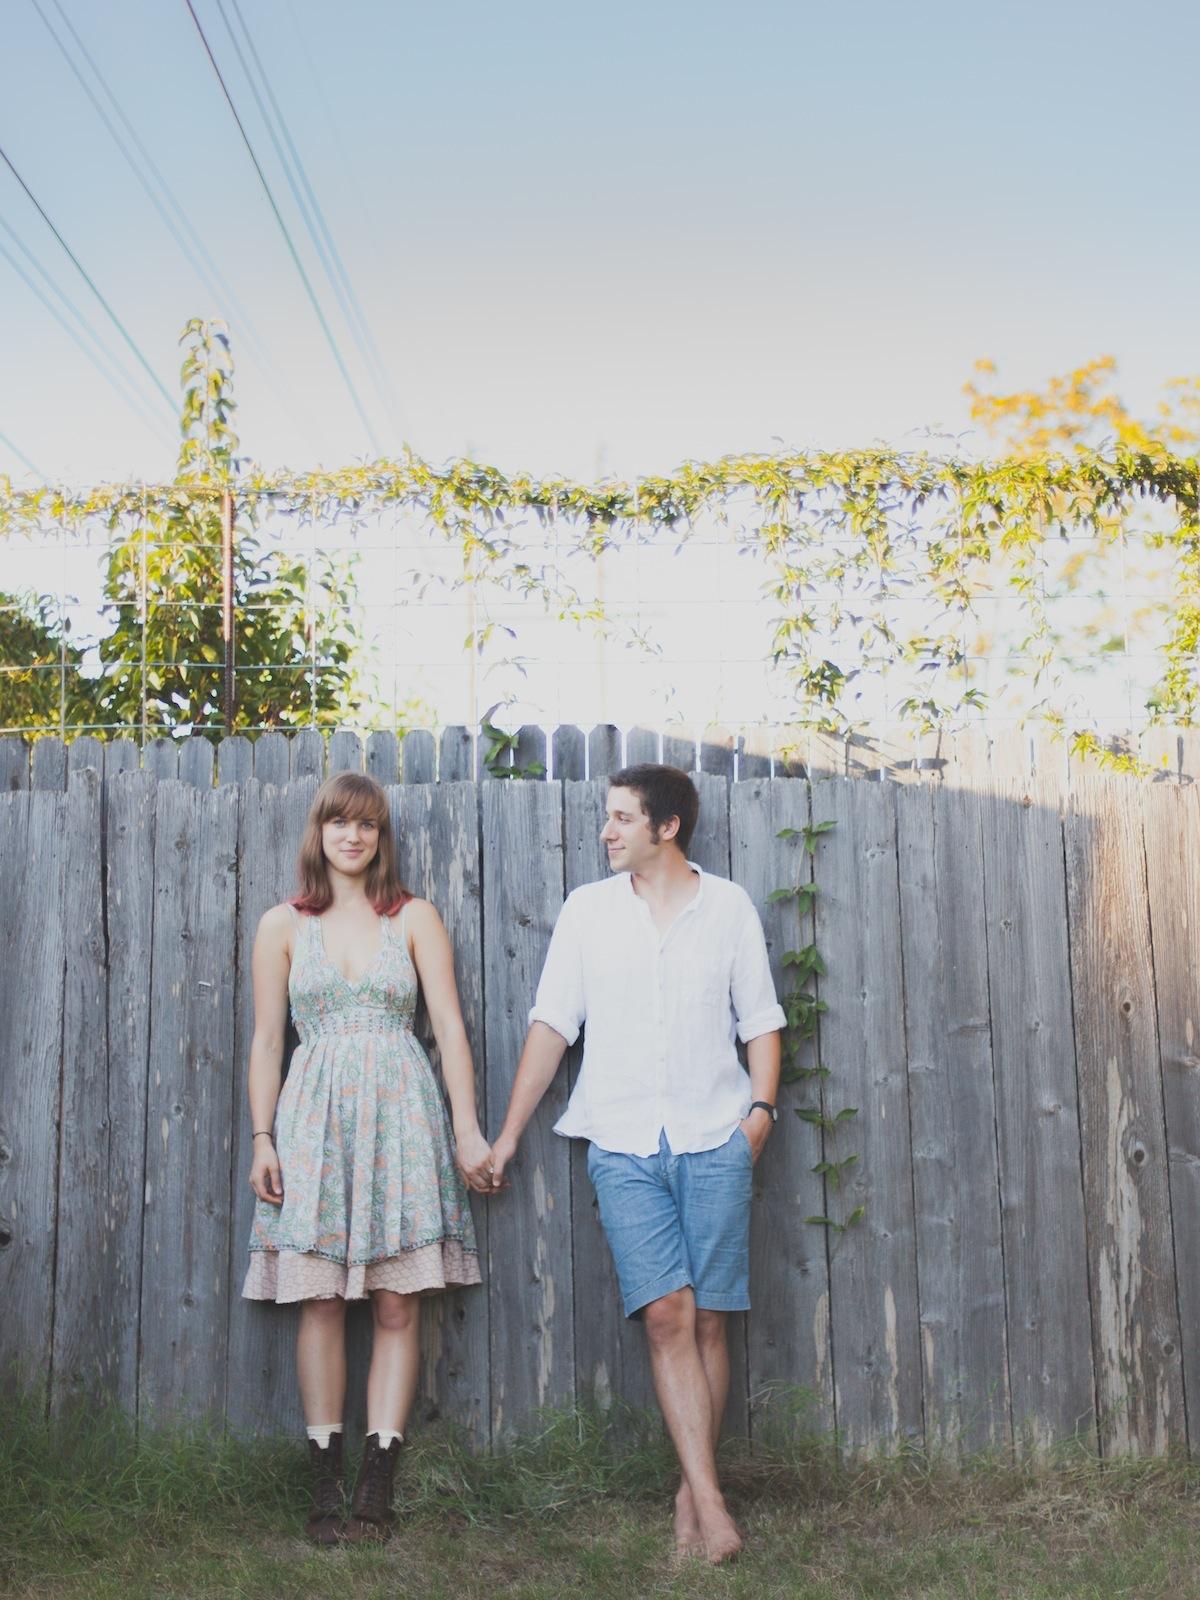 Urban_Garden_Austin_Texas_Portraits-17.jpg